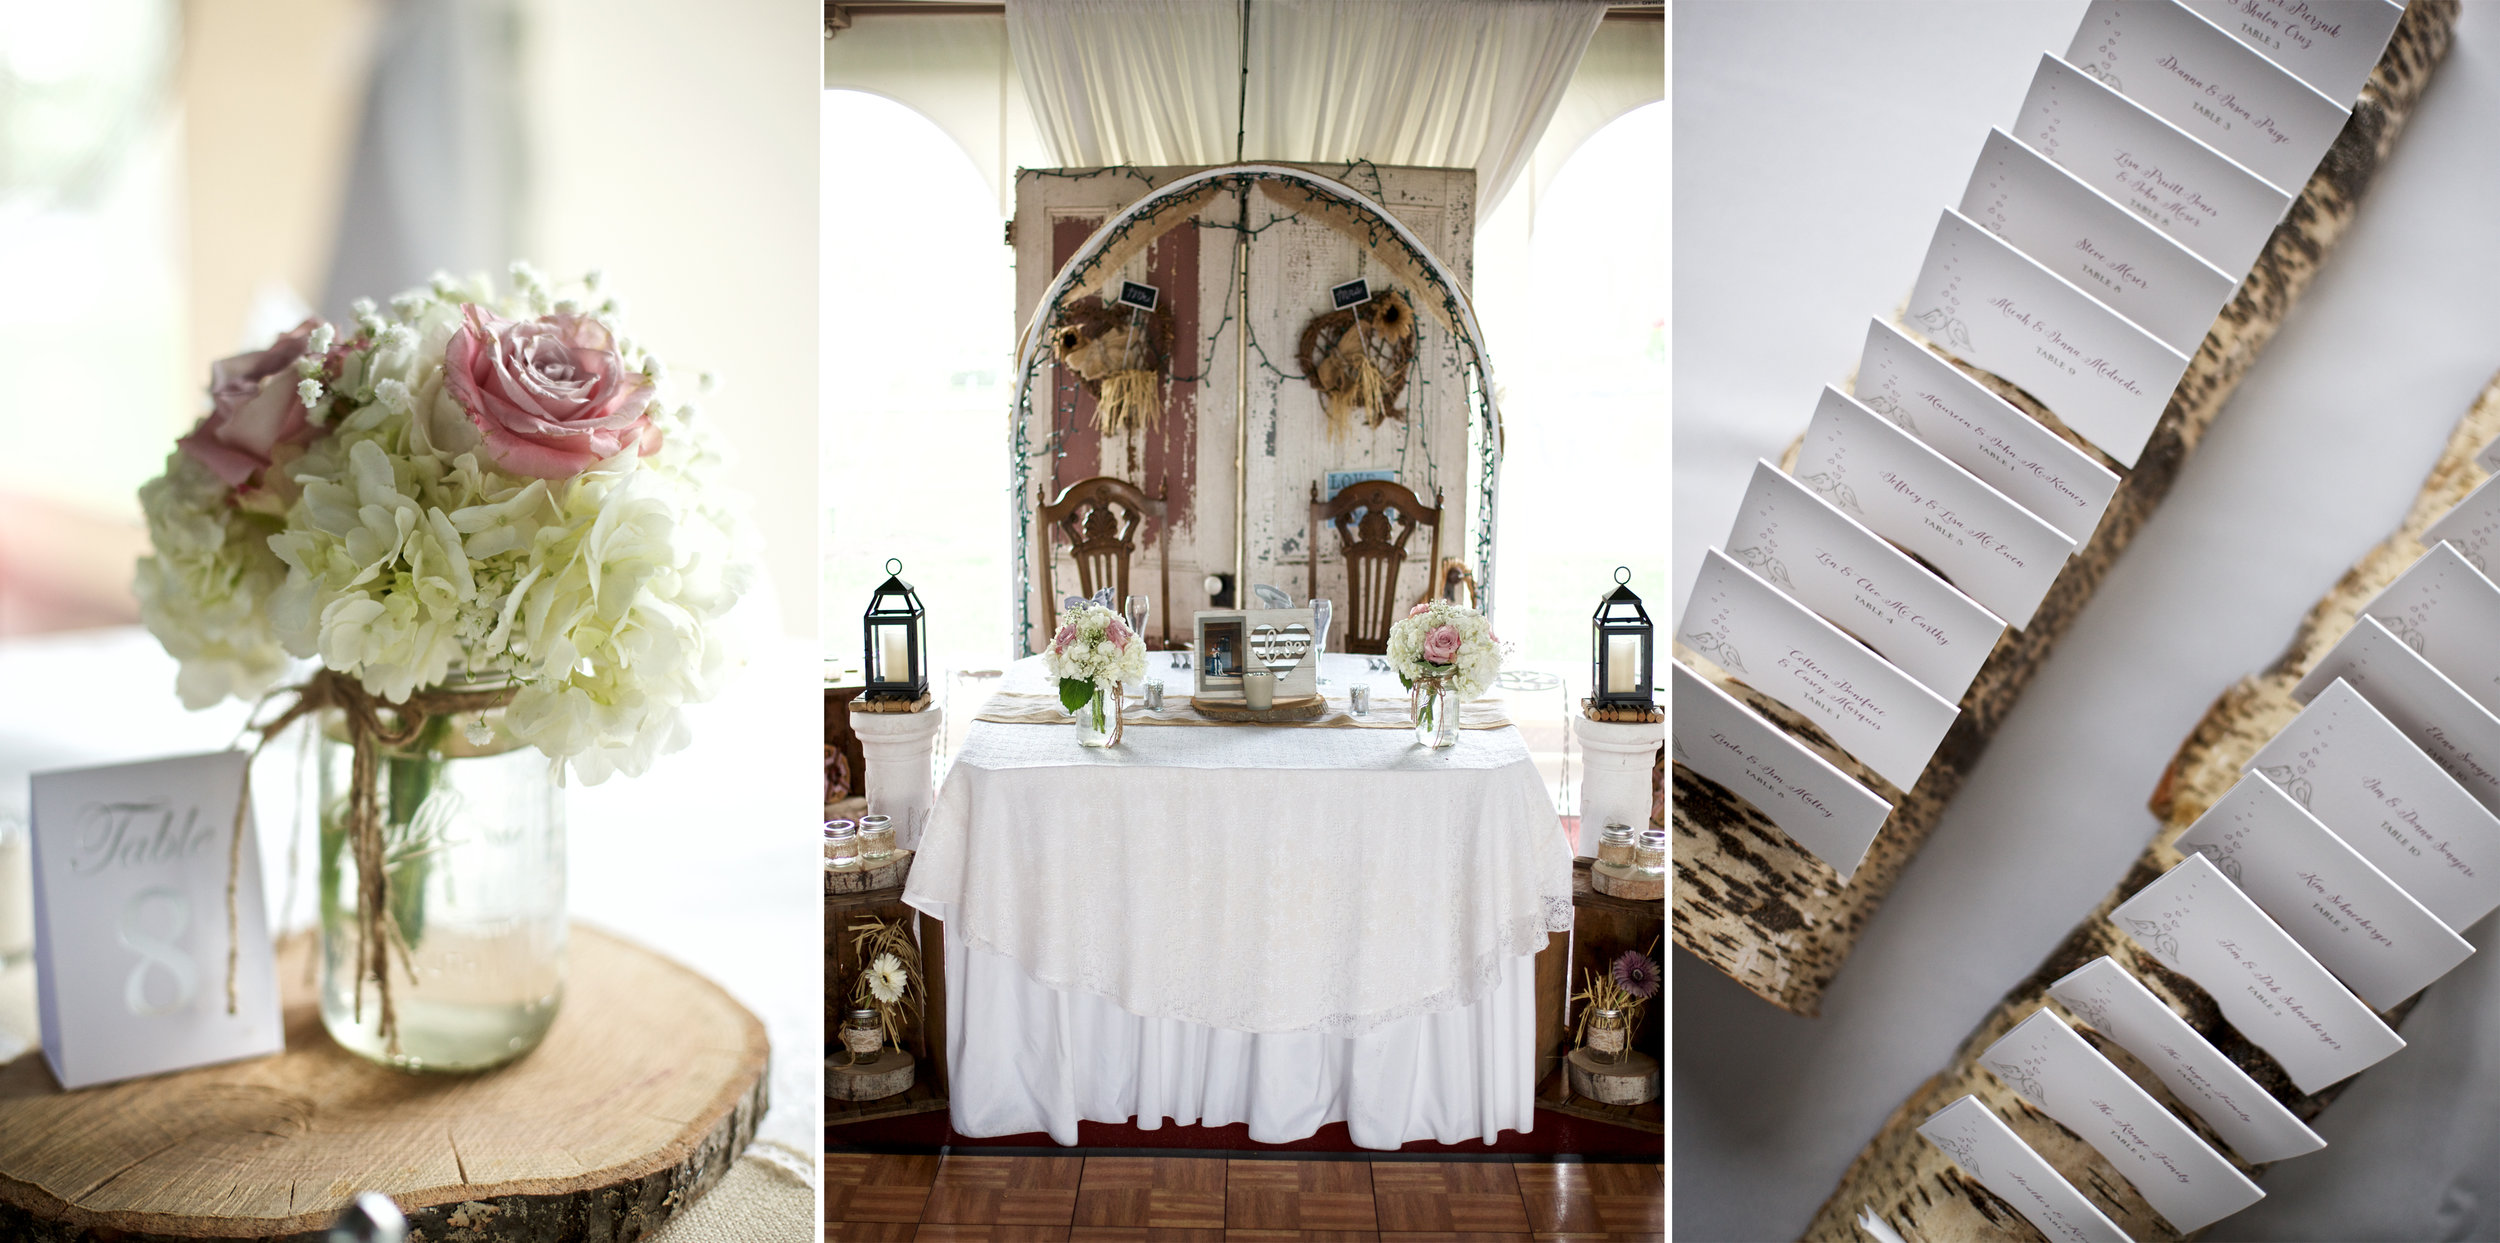 Lippincott manor wedding, wallkill ny wedding, photography, photos p.jpg